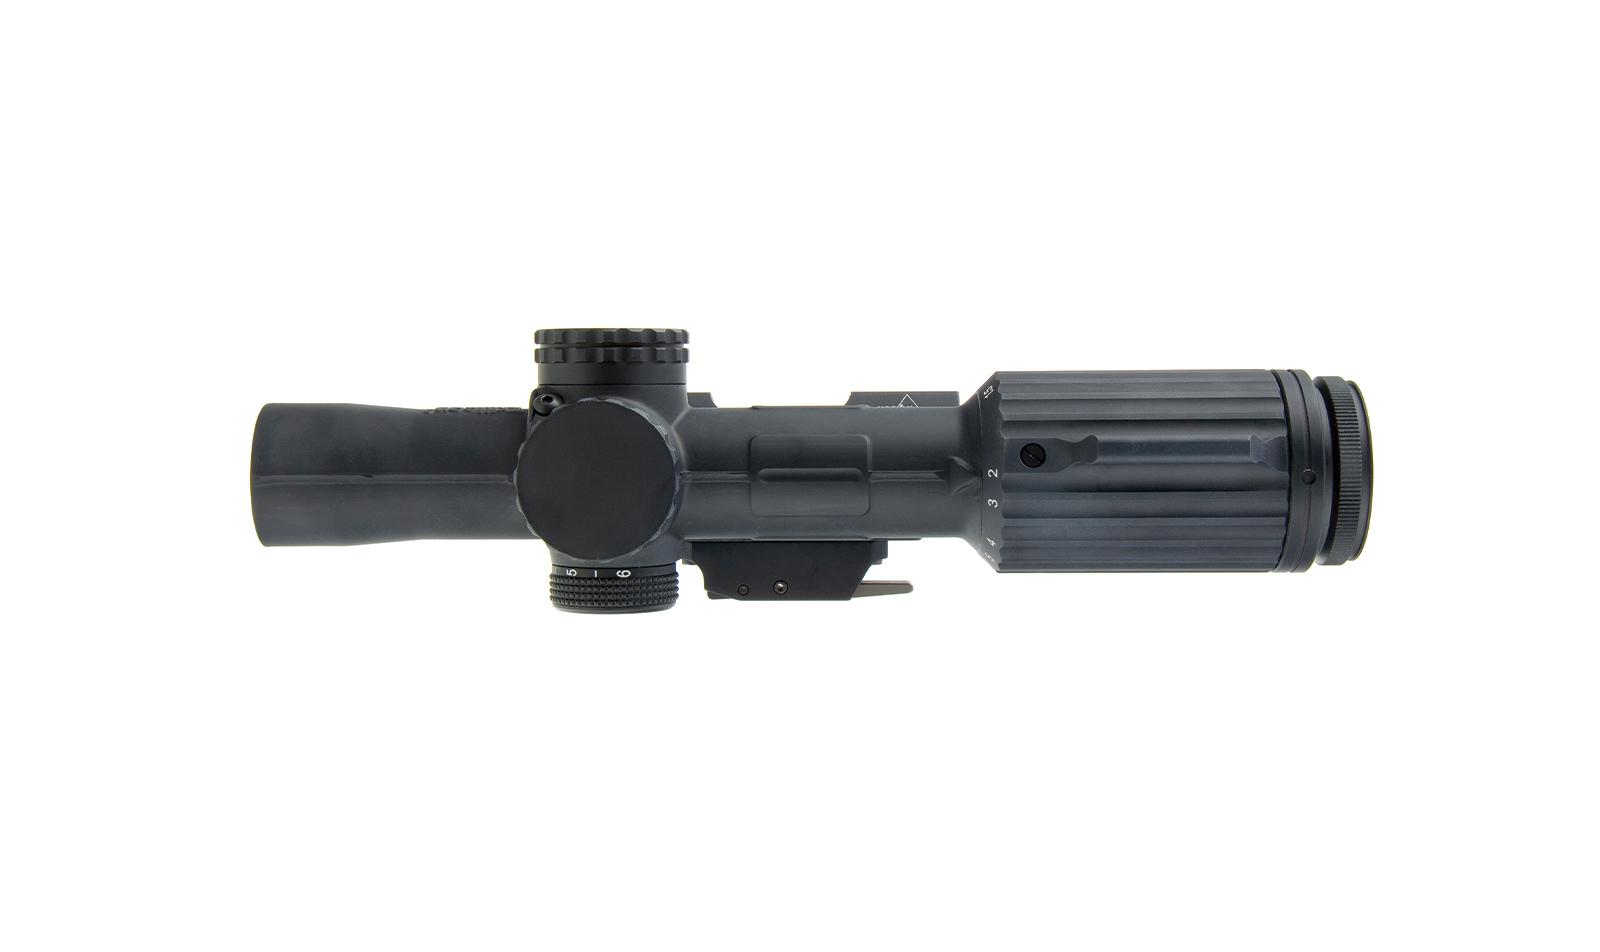 VC16-C-1600010 angle 9